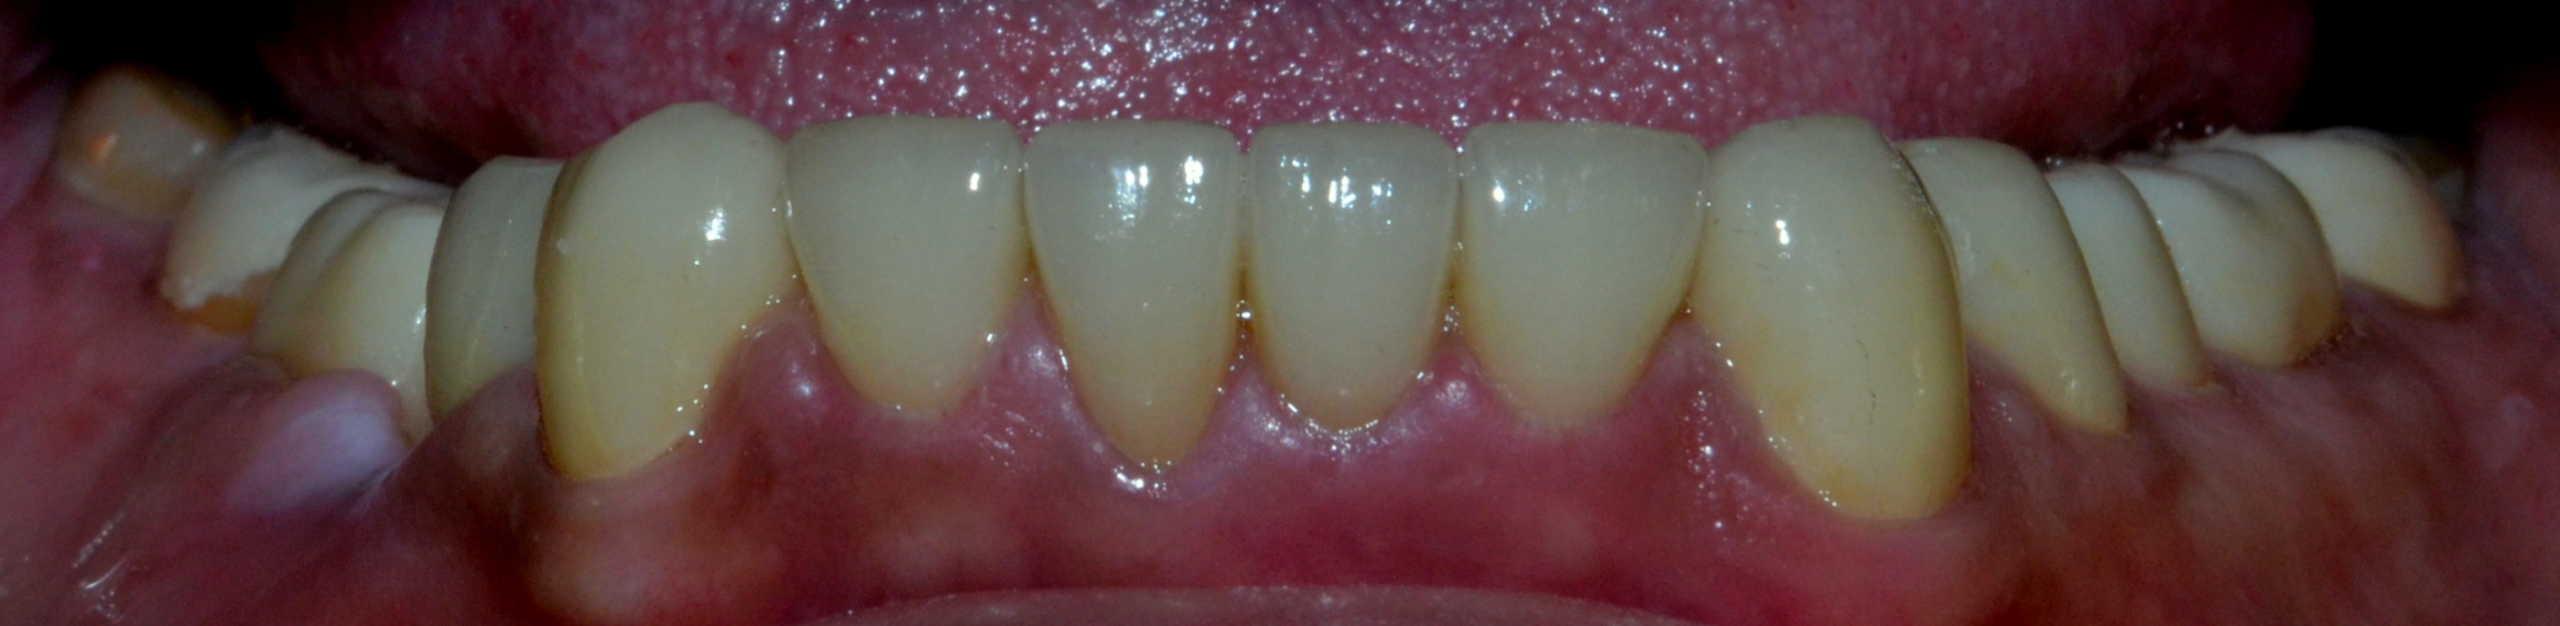 Final Lower teeth